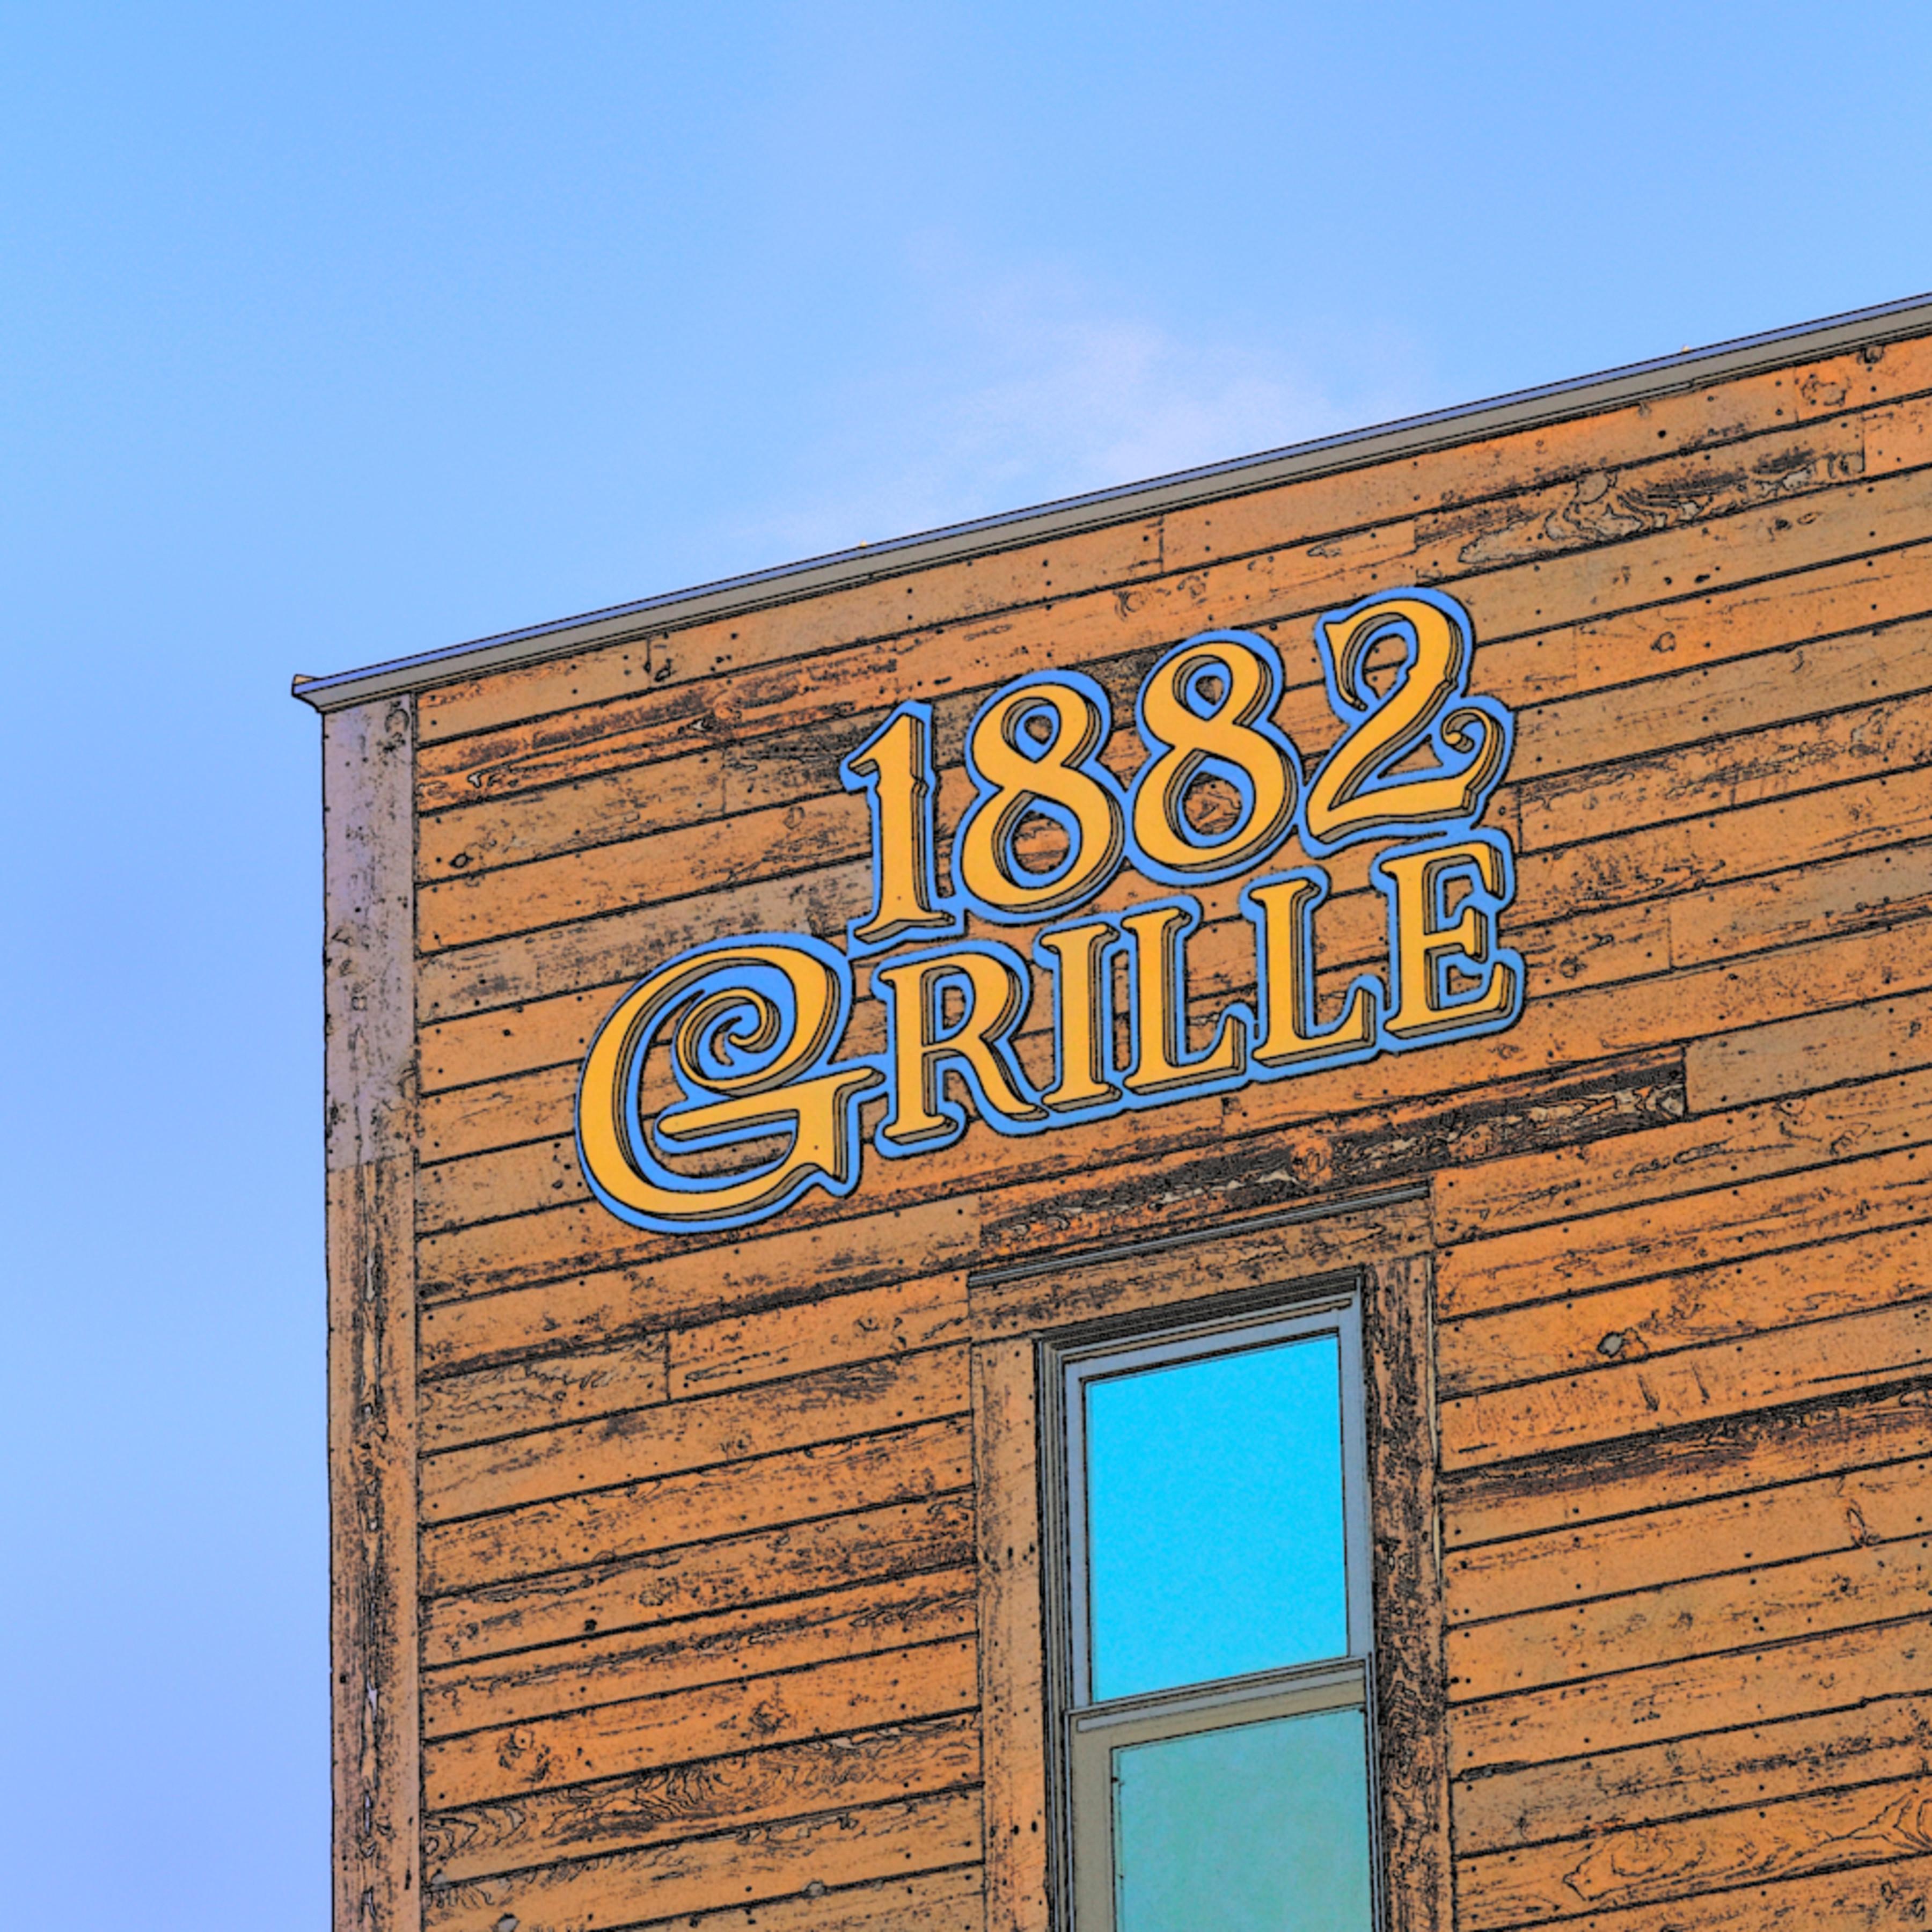 1882 grille graphics window n0icrk